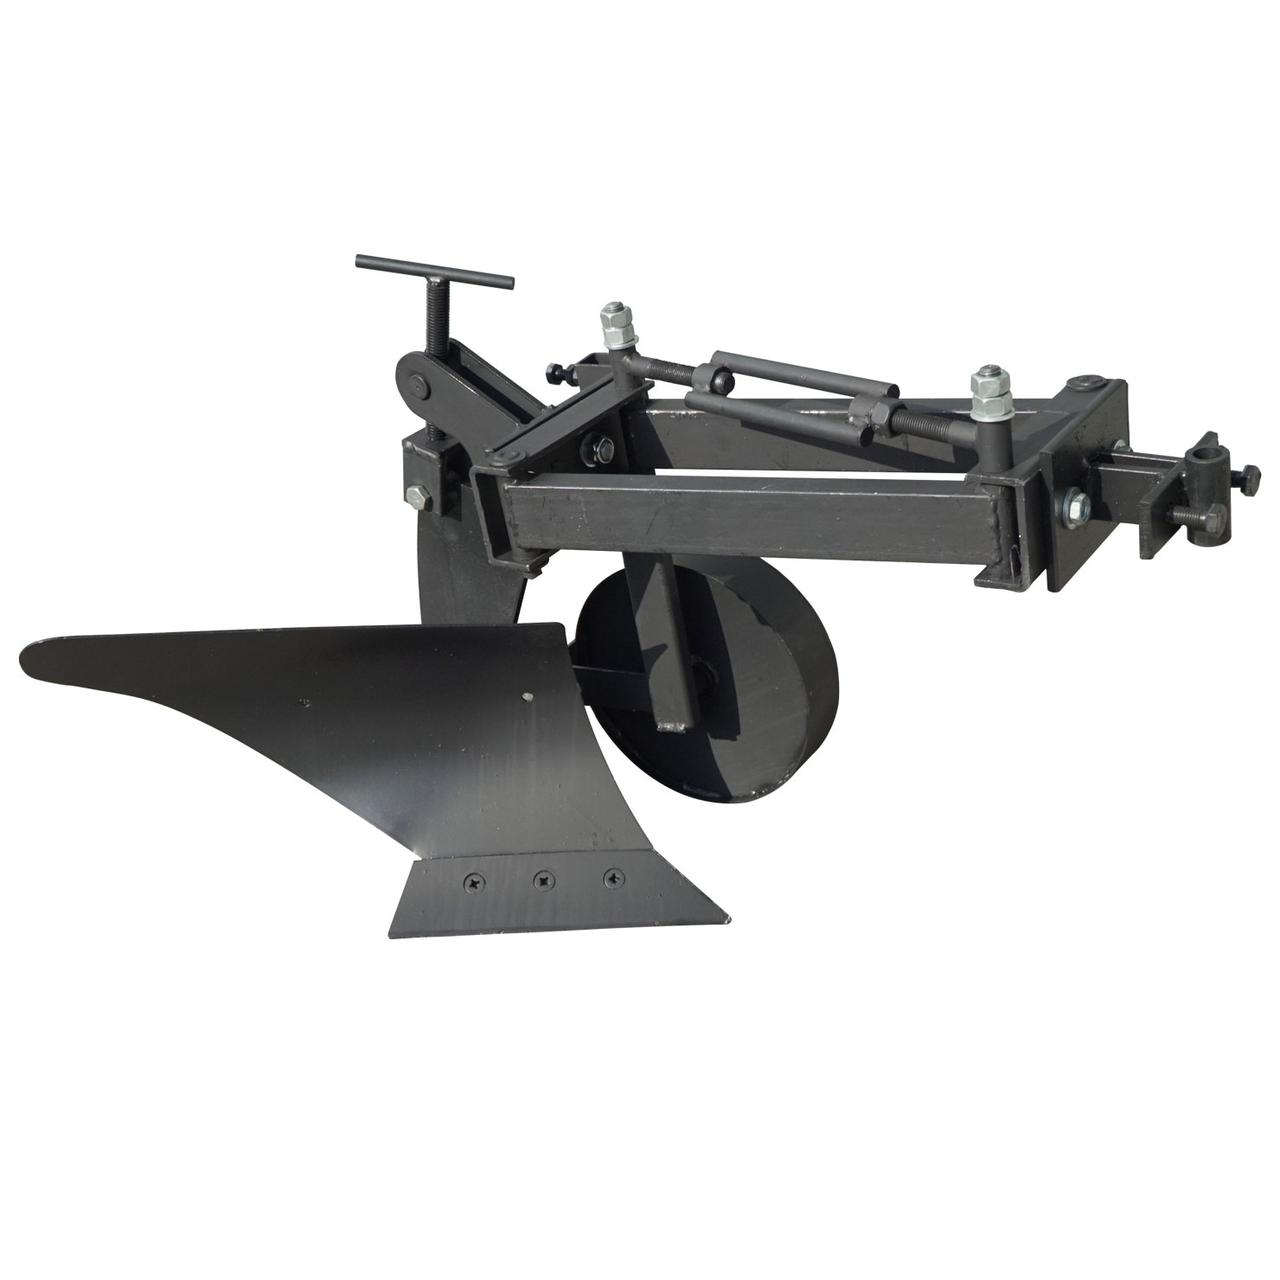 Плуг для мотоблока Zirka-61 (опорне колесо, коротка рама), ПЛ10